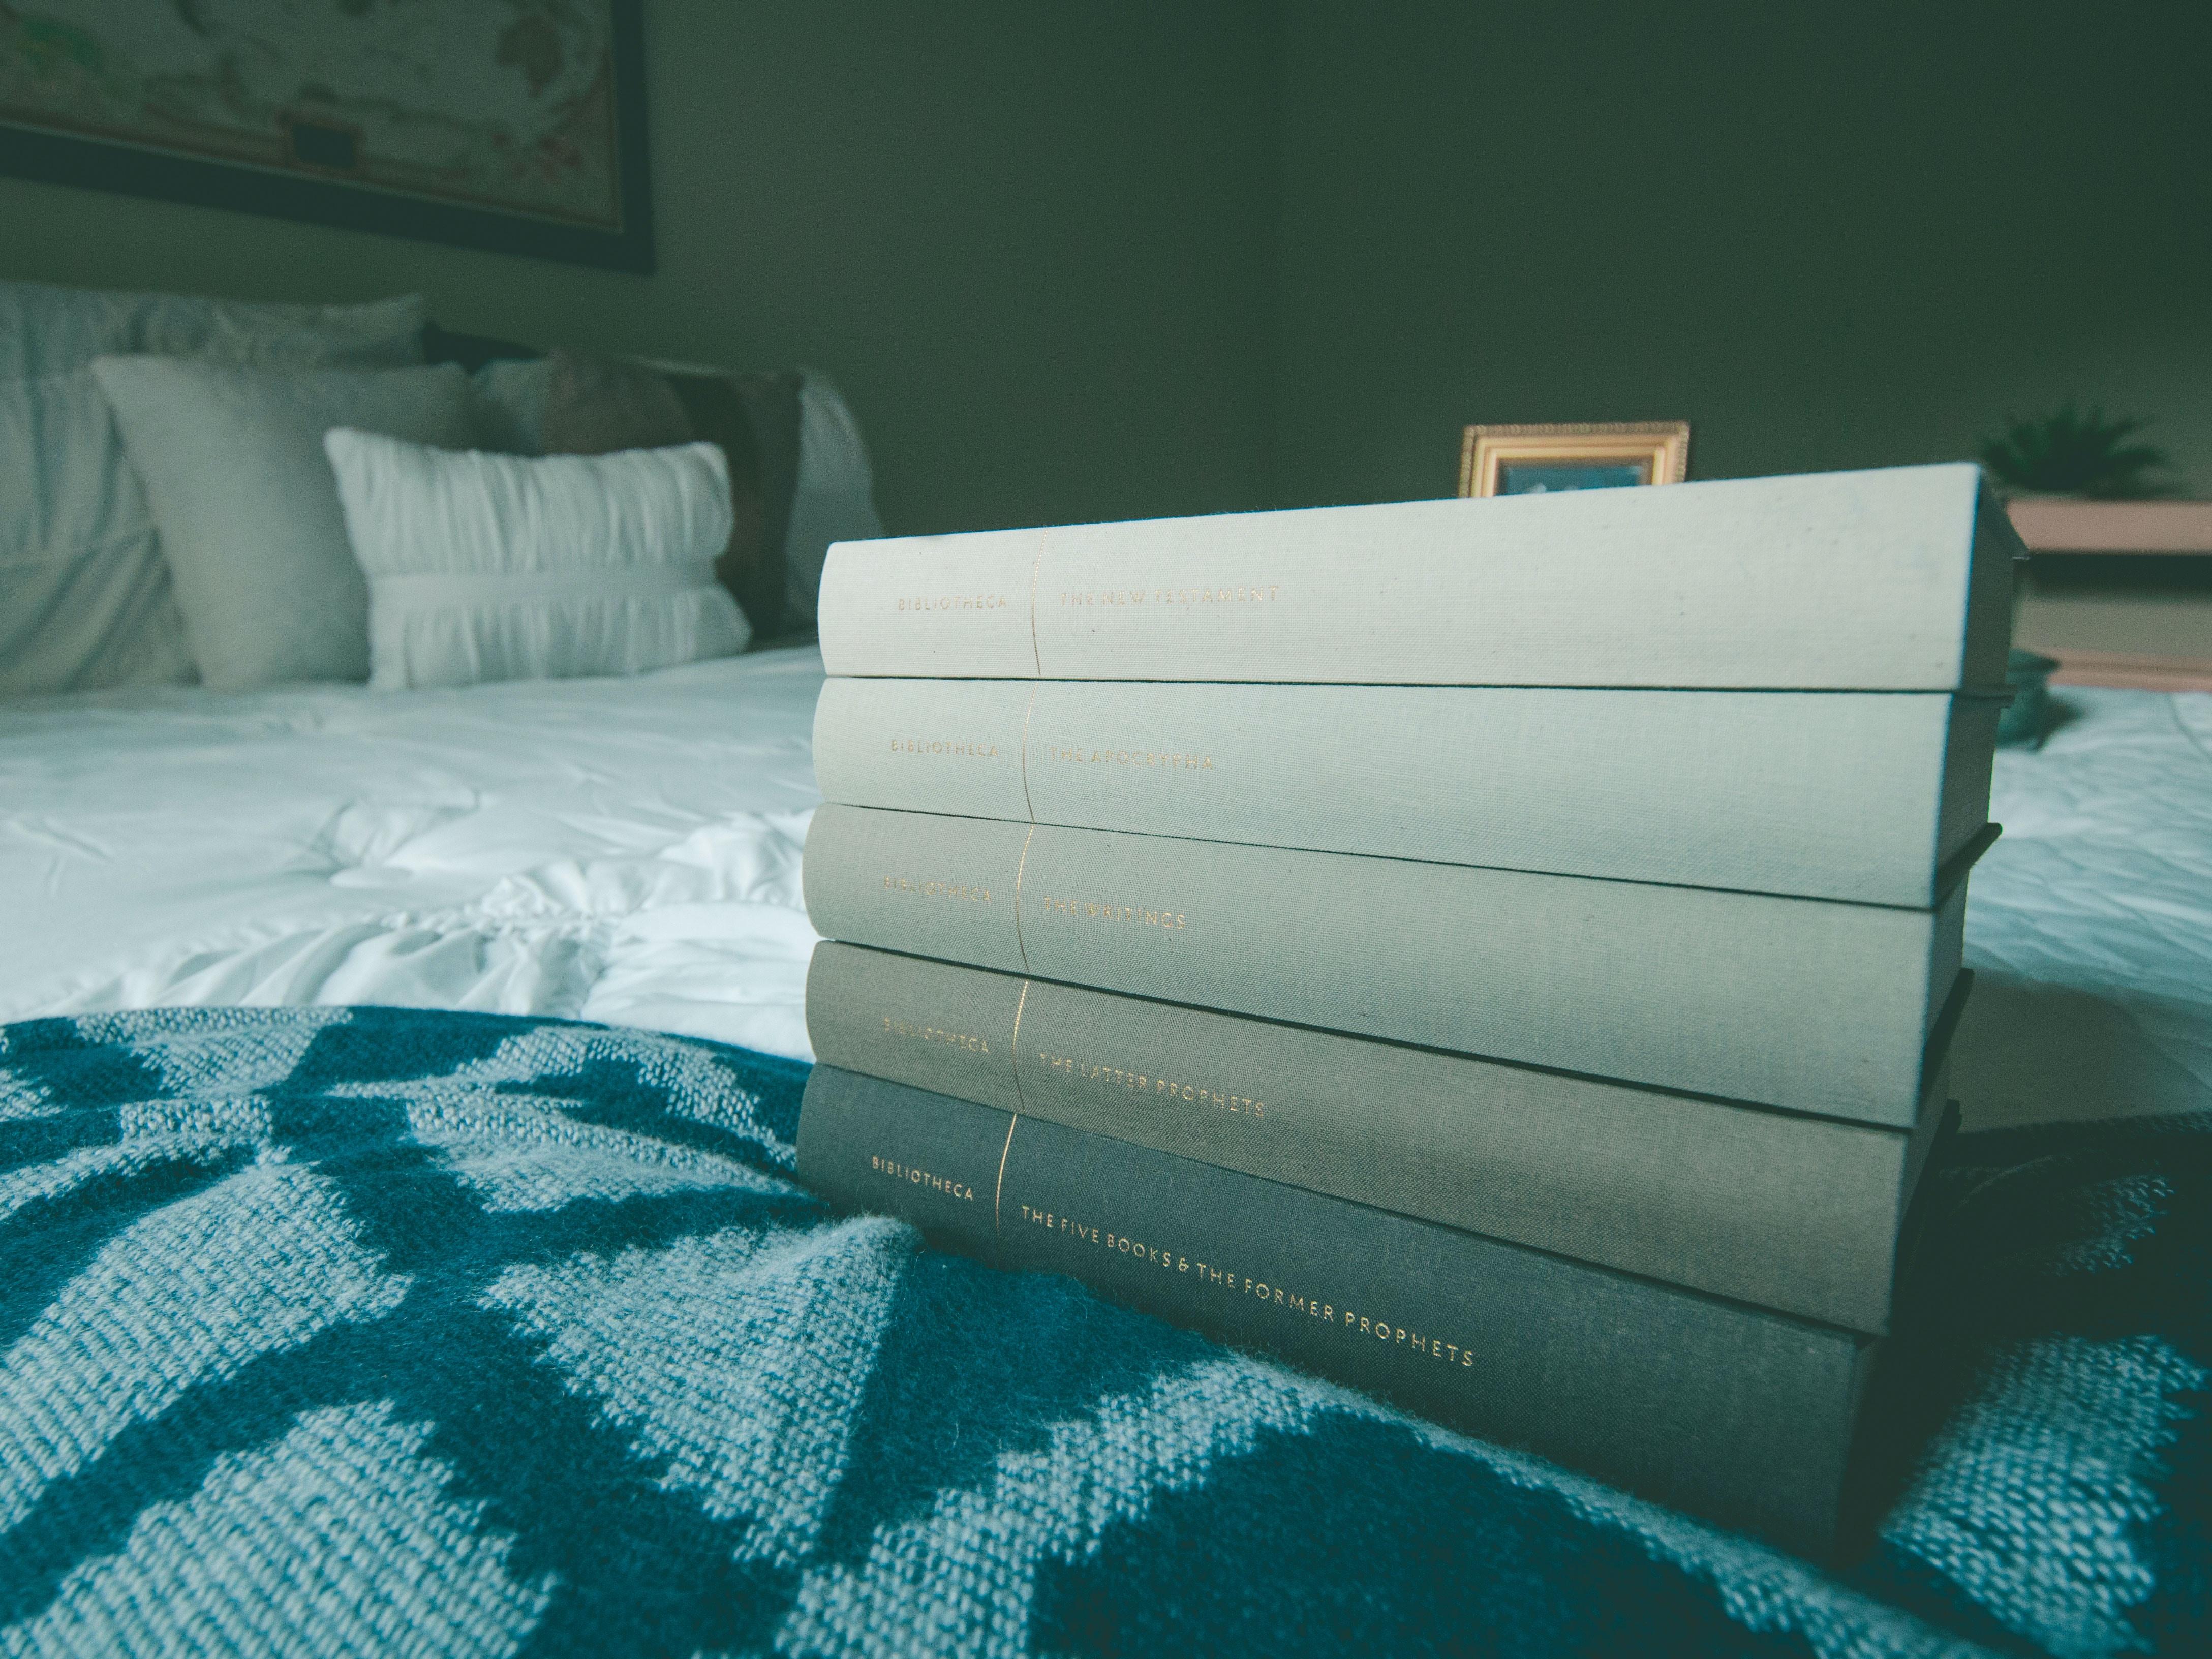 several books on blue bed comforter